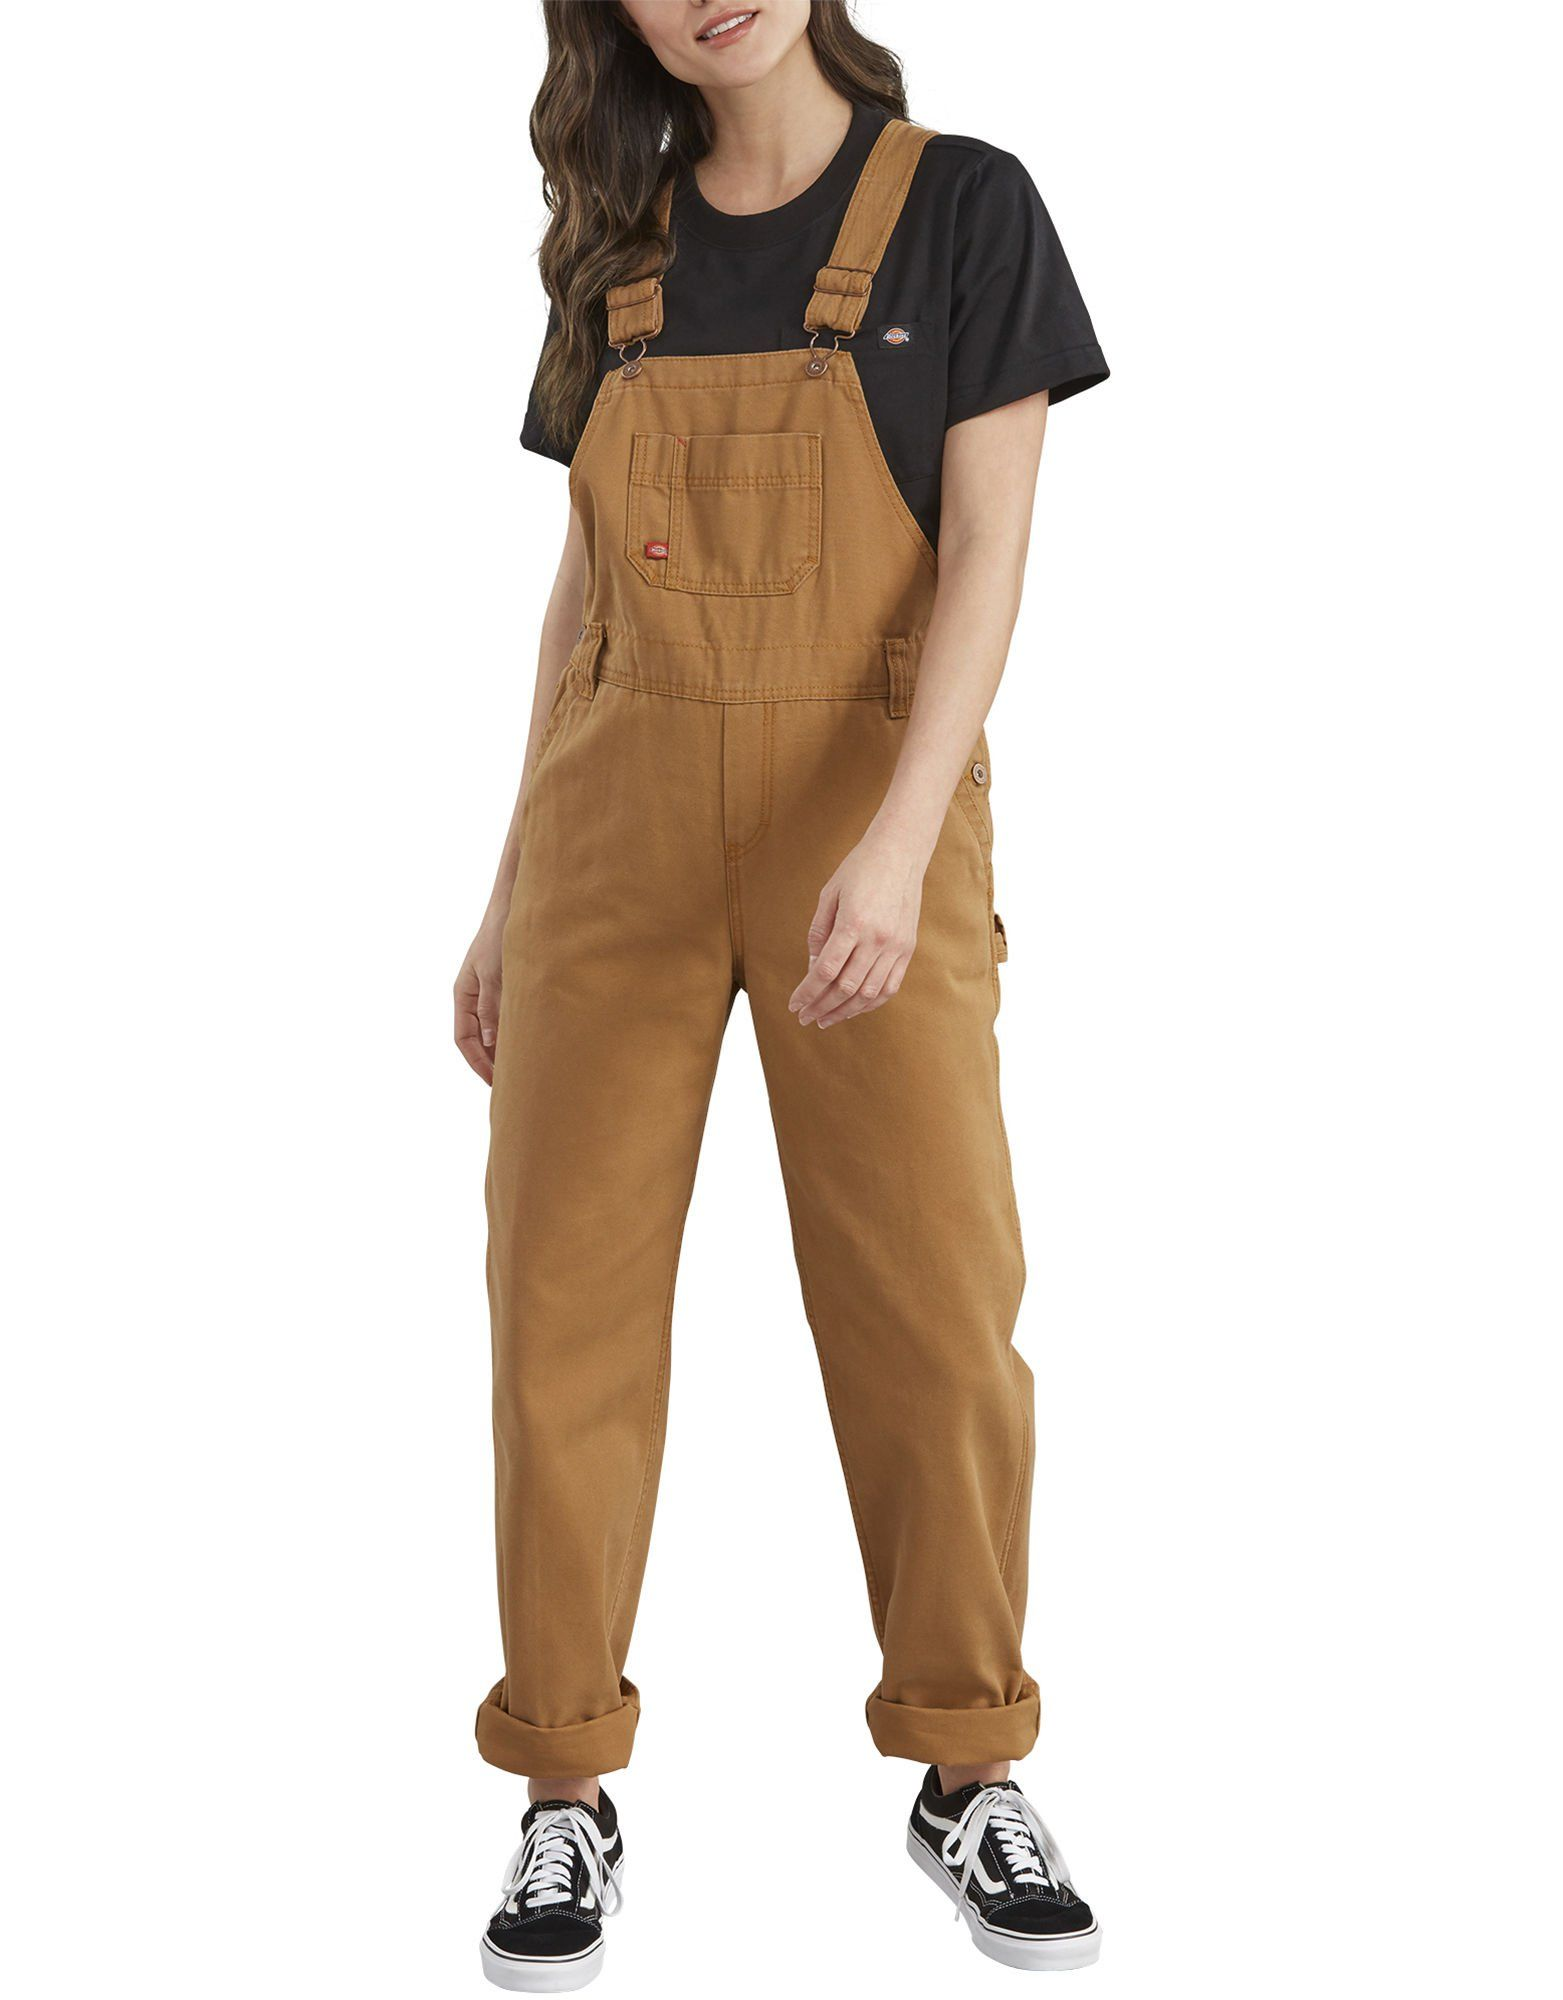 7b65eacb795 Women's Bib Overalls, Brown Duck in 2019 | Clothes | Overalls women ...